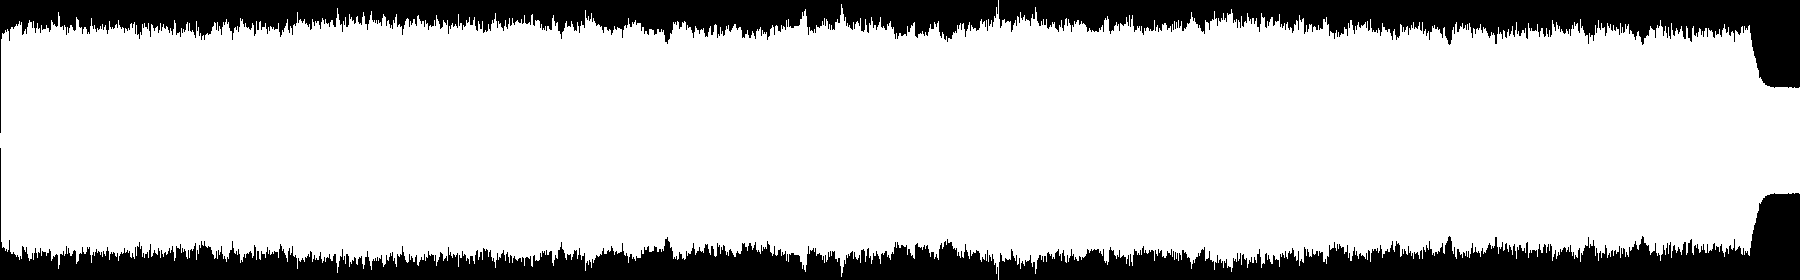 LO-FI Films audio waveform